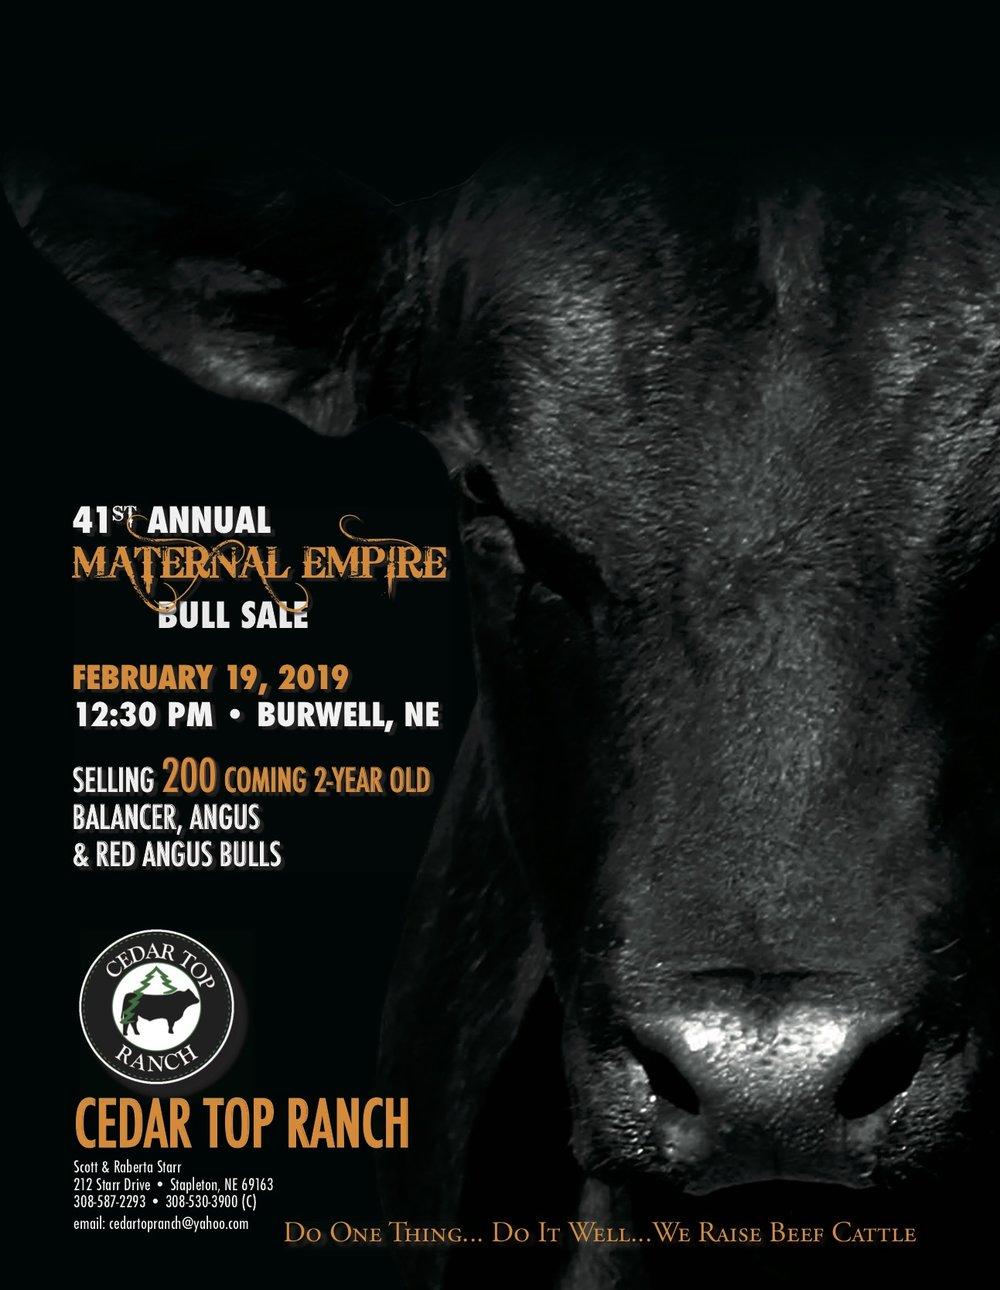 Cedar_Top_Ranch_12_18_GW.jpg